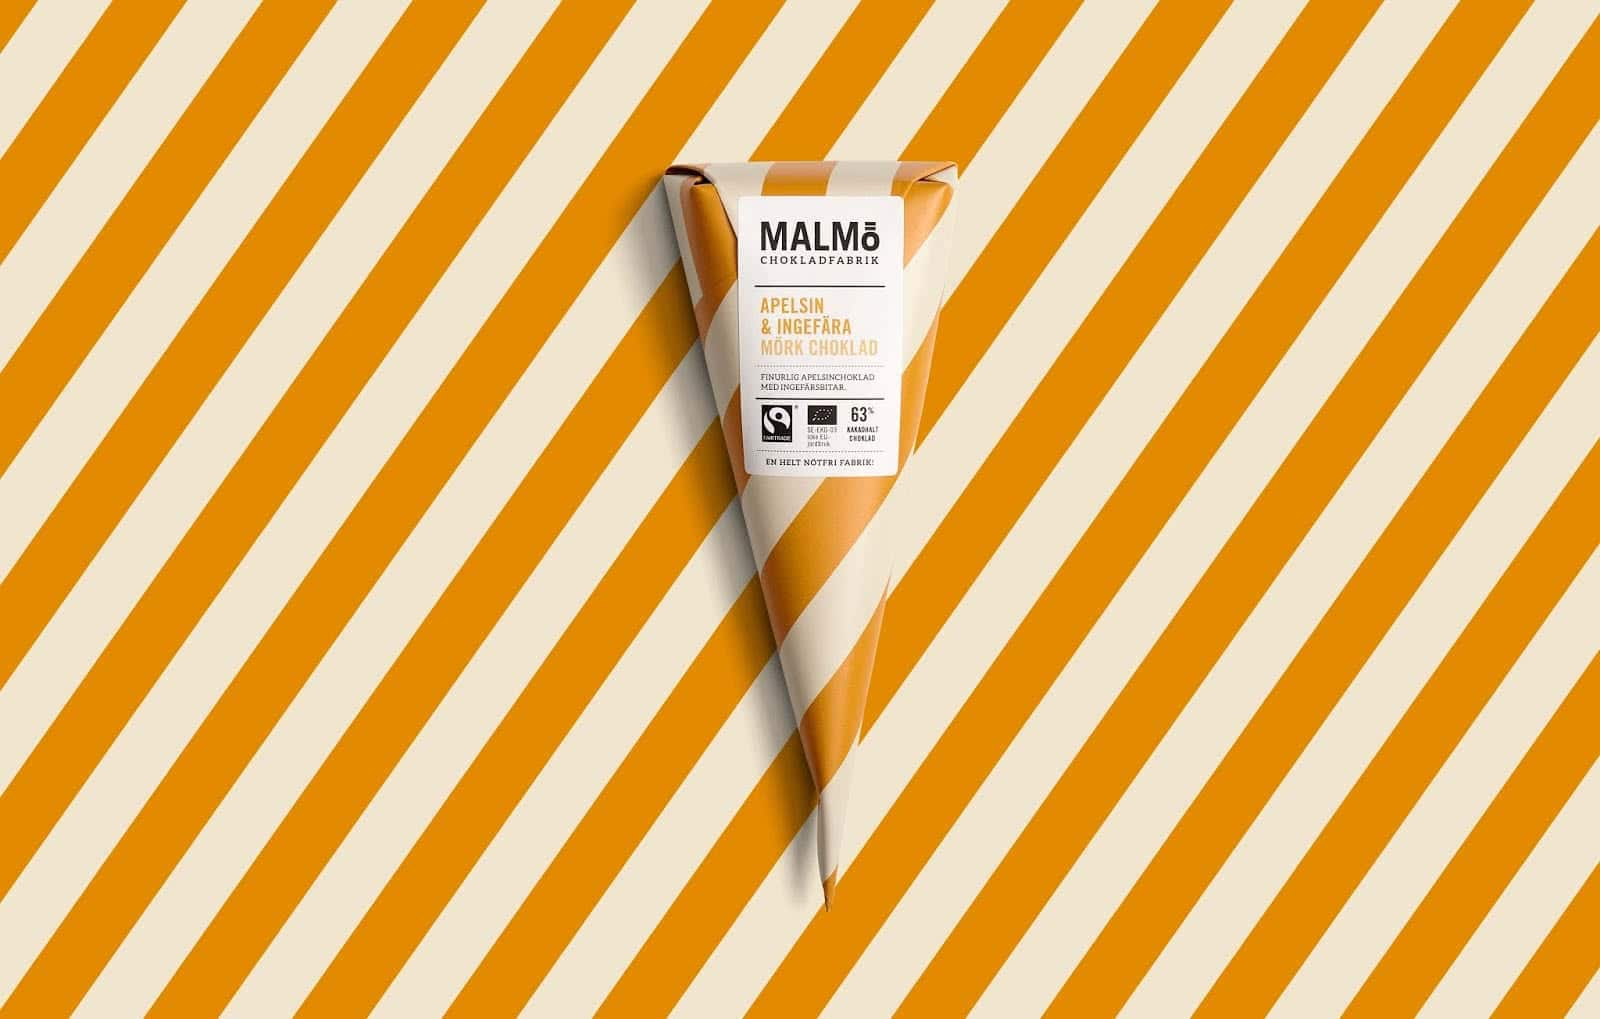 pond-design-malmo-chokladfabrik striped packagings